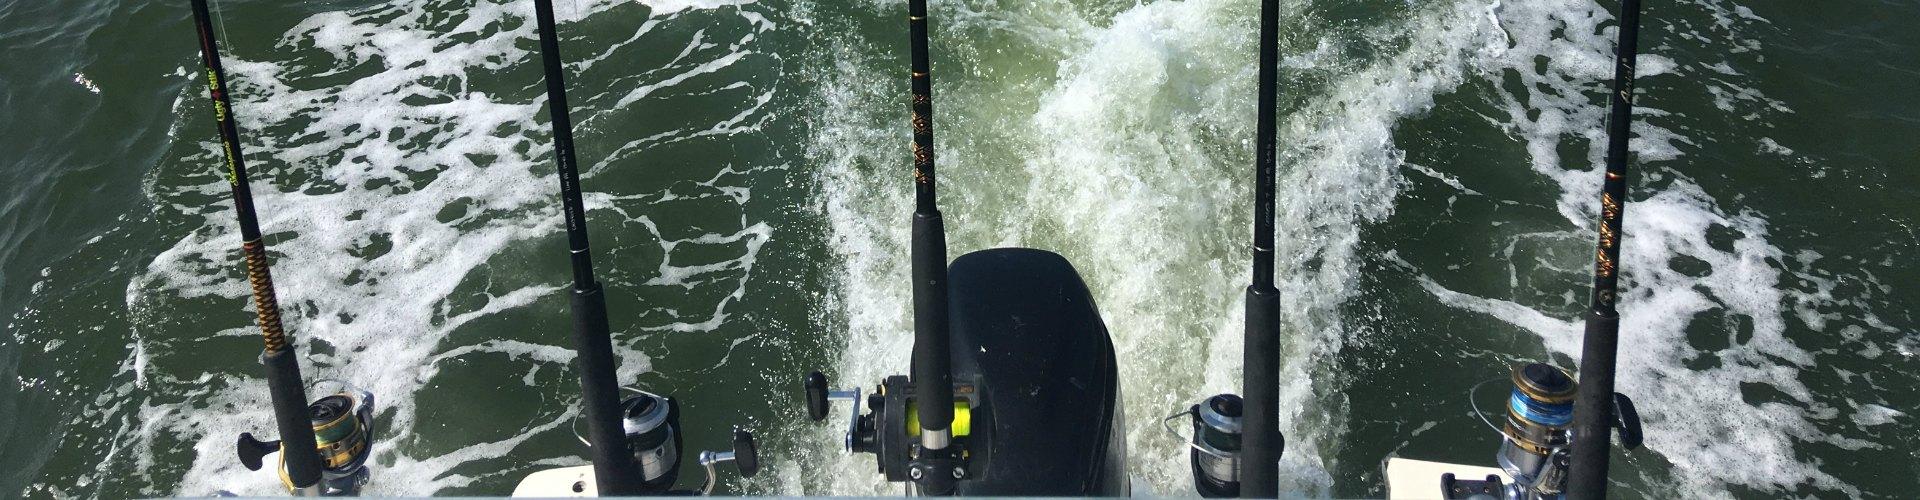 Fishing Tours On Hilton Head Island